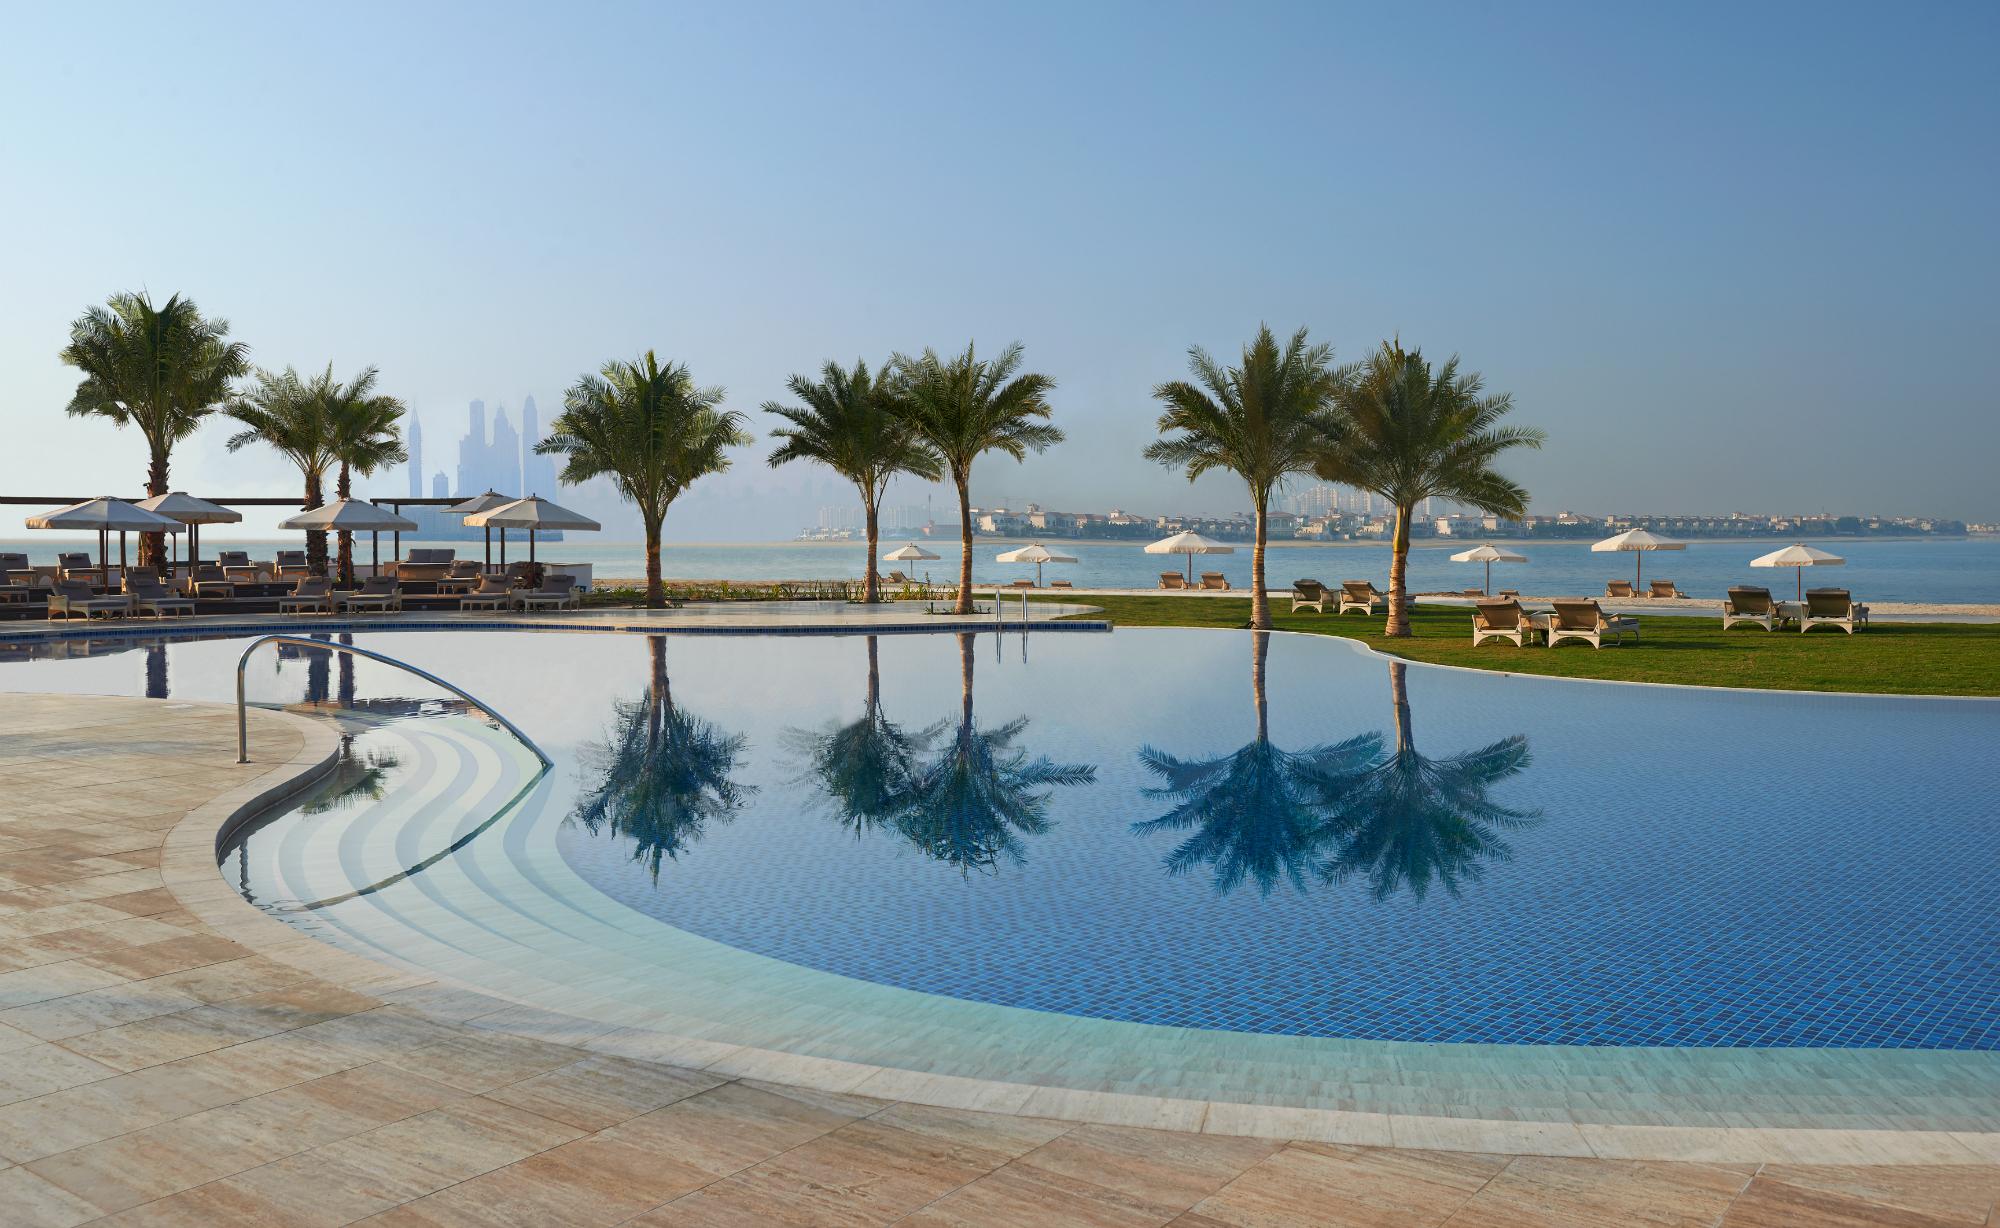 Hotel pool palm trees